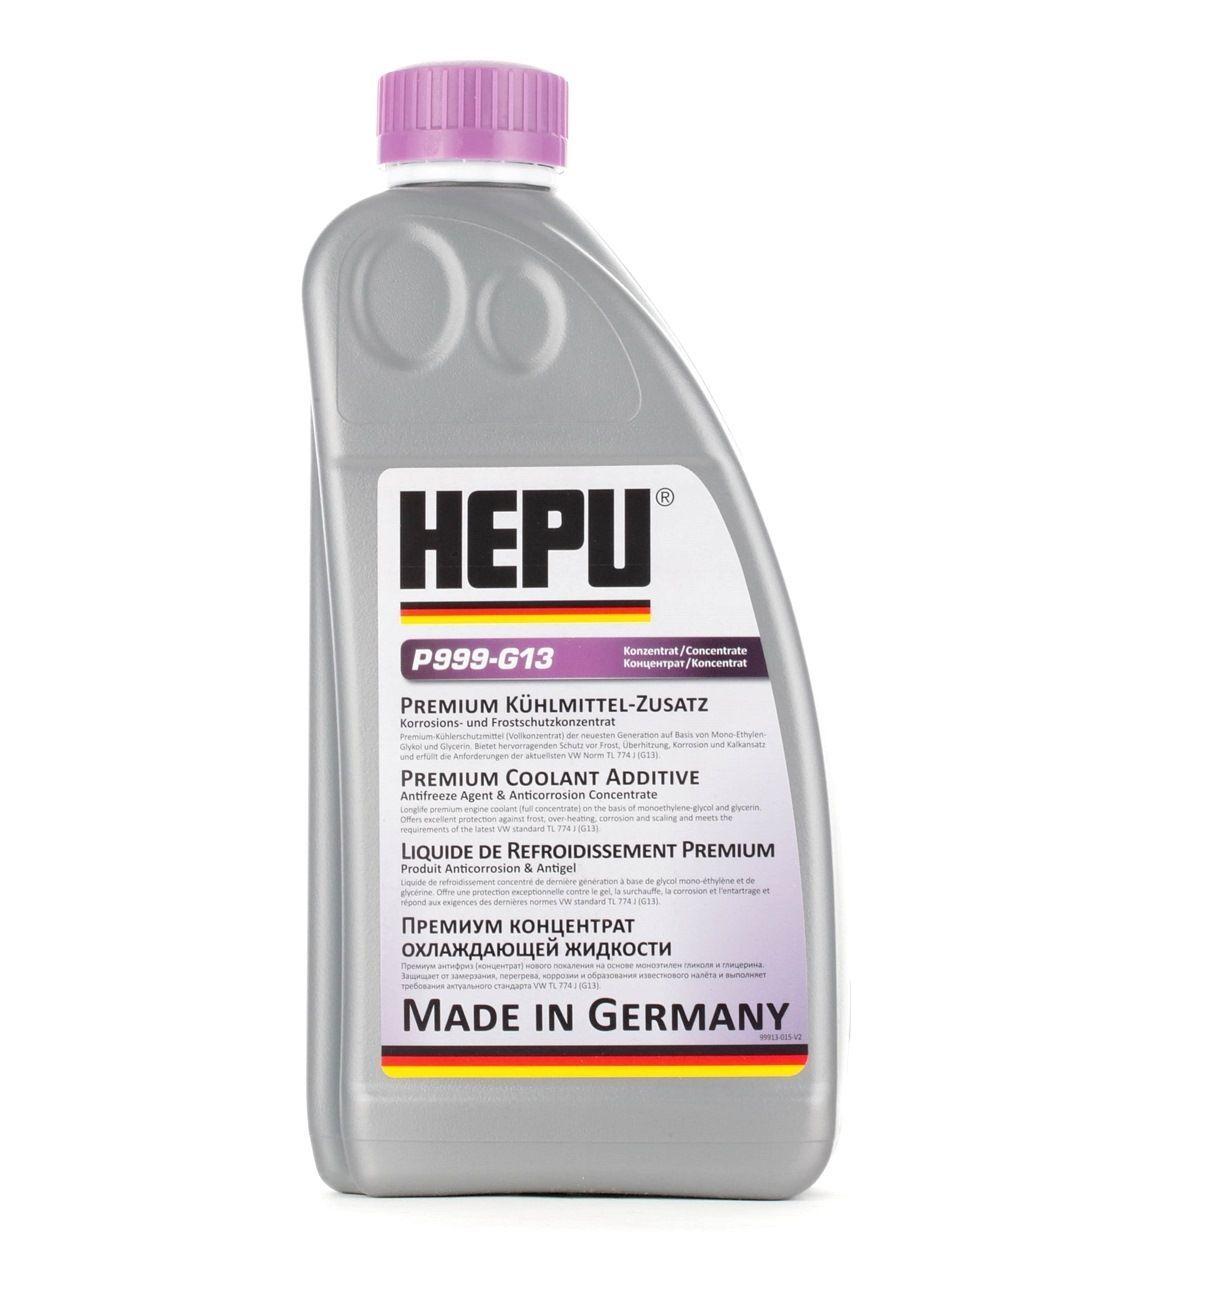 HEPU Antigel P999-G13 AUDI,VW,SKODA,A3 8P1,A3 Sportback 8PA,A4 8K2, B8,A4 Avant 8K5, B8,Q5 8R,A6 4F2, C6,Q7 4L,A5 8T3,A6 Avant 4F5, C6,A1 8X1, 8XF